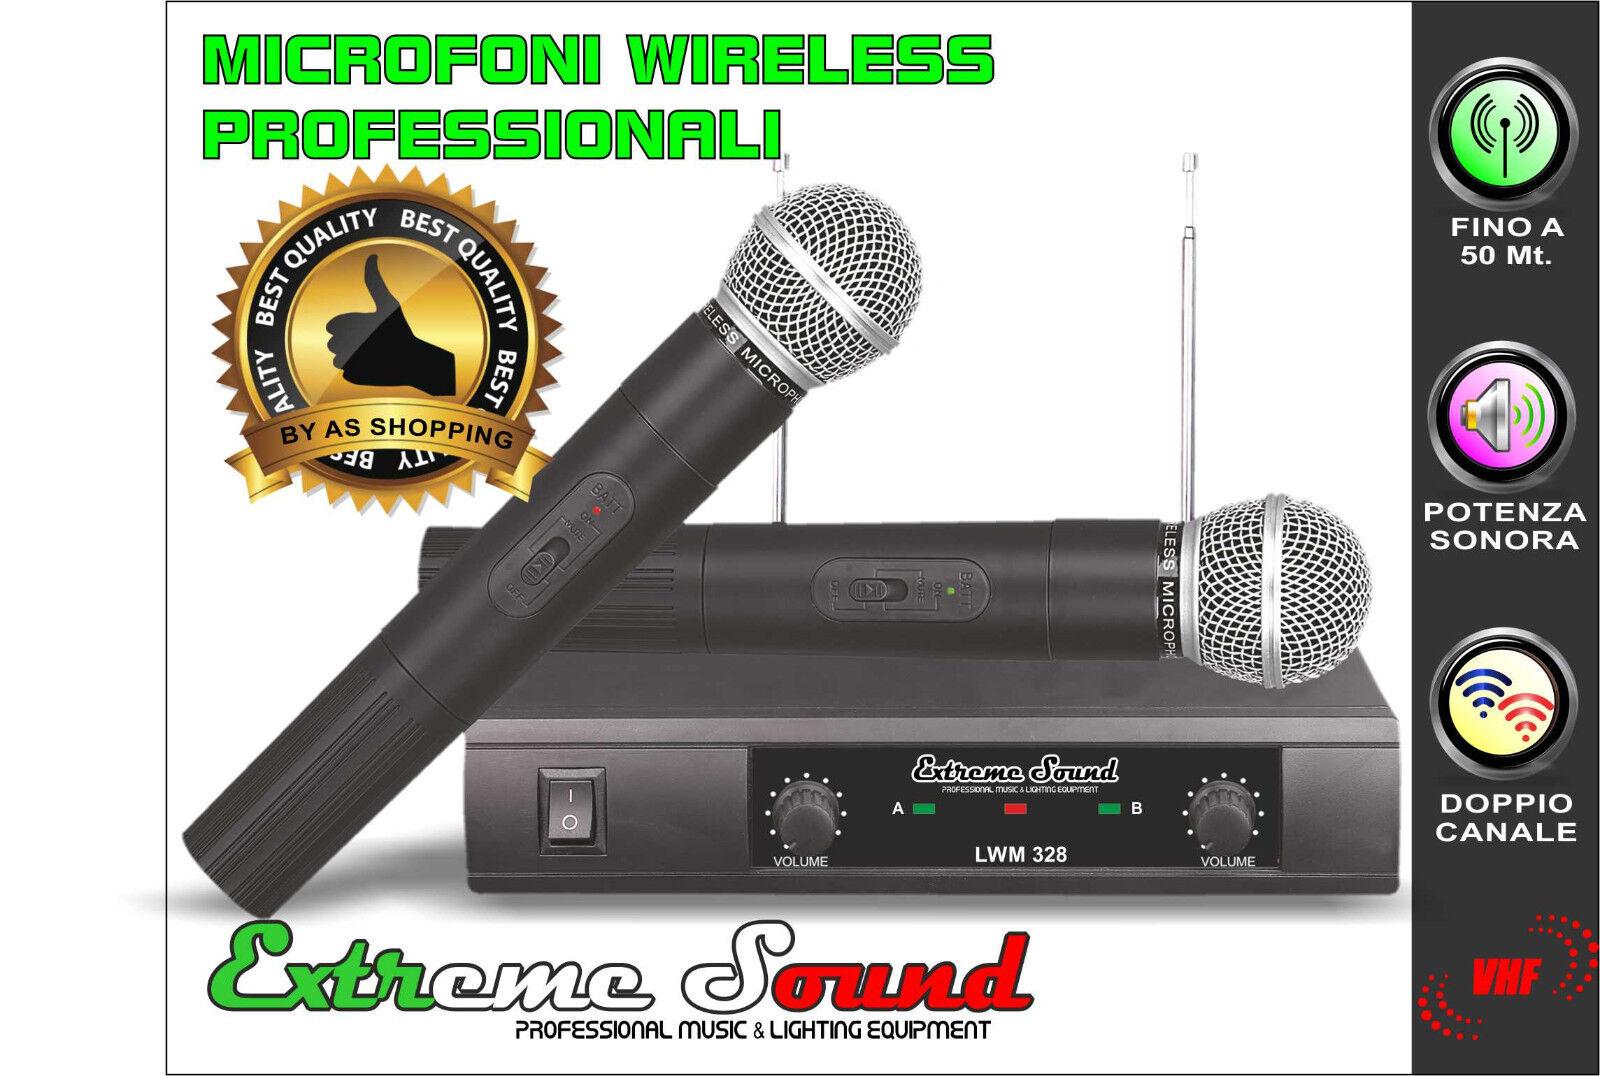 KIT Radio Microfoni PROFESSIONALI VHF EXTREME SOUND Senza Fili Wireless LWM-328